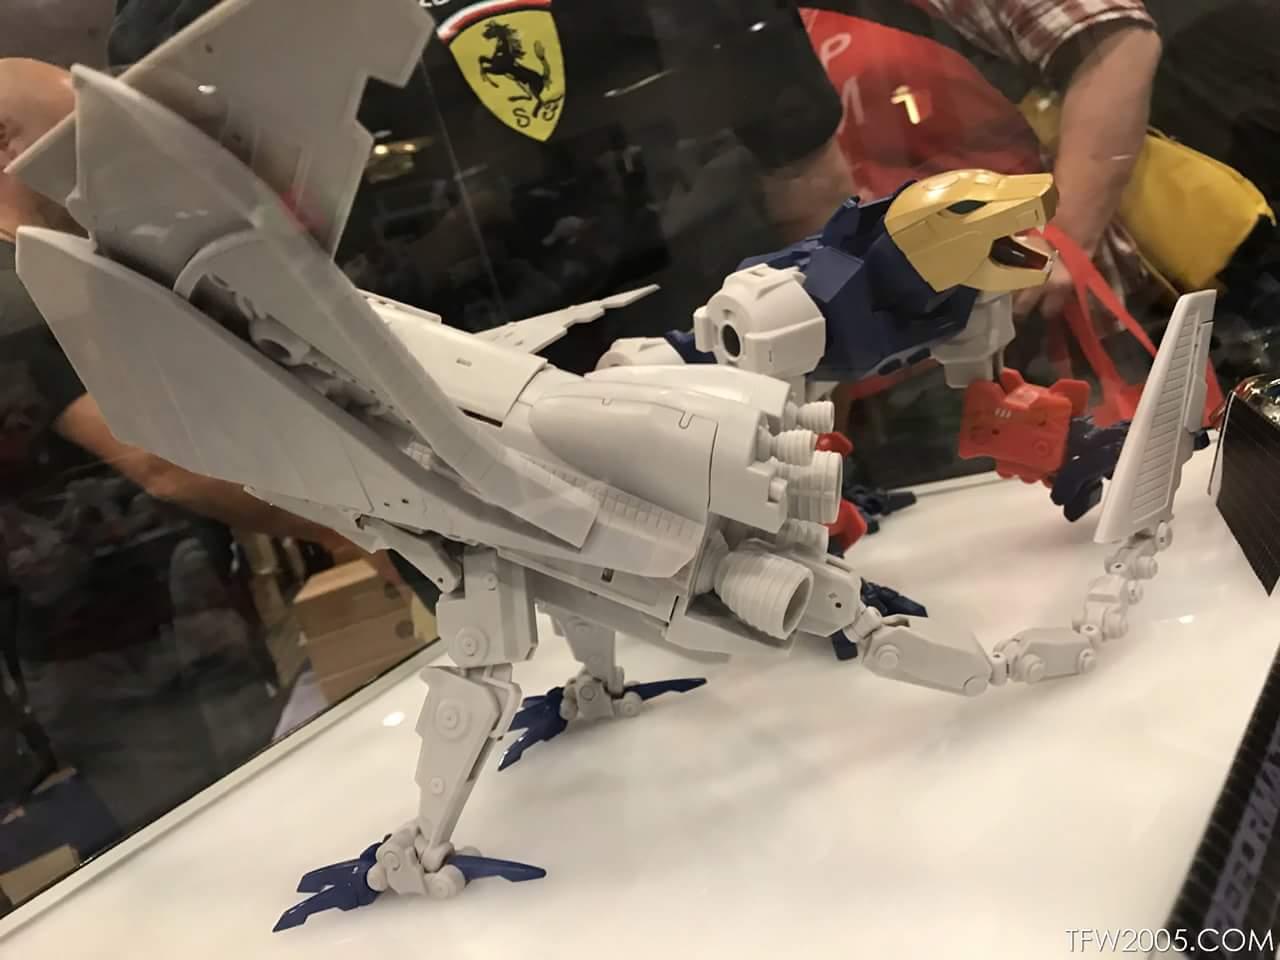 [Mastermind Creations] Produit Tiers - Reformatted Magna Inventa (R-35 Magna et R-36 Inventa) - aka Sky-Lynx/Chaînon YJllEdkE_o